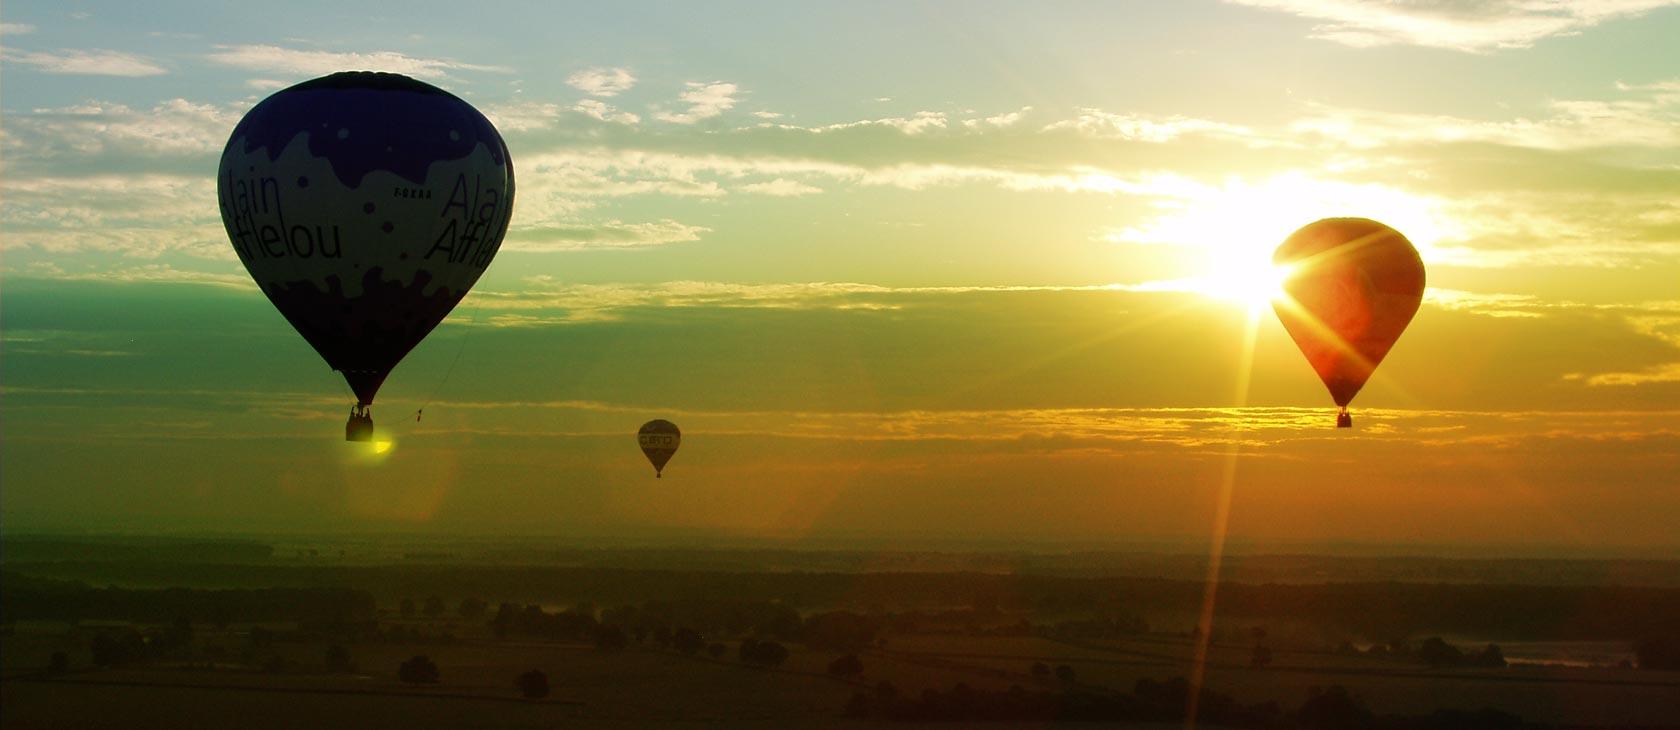 vol-montgolfiere-2